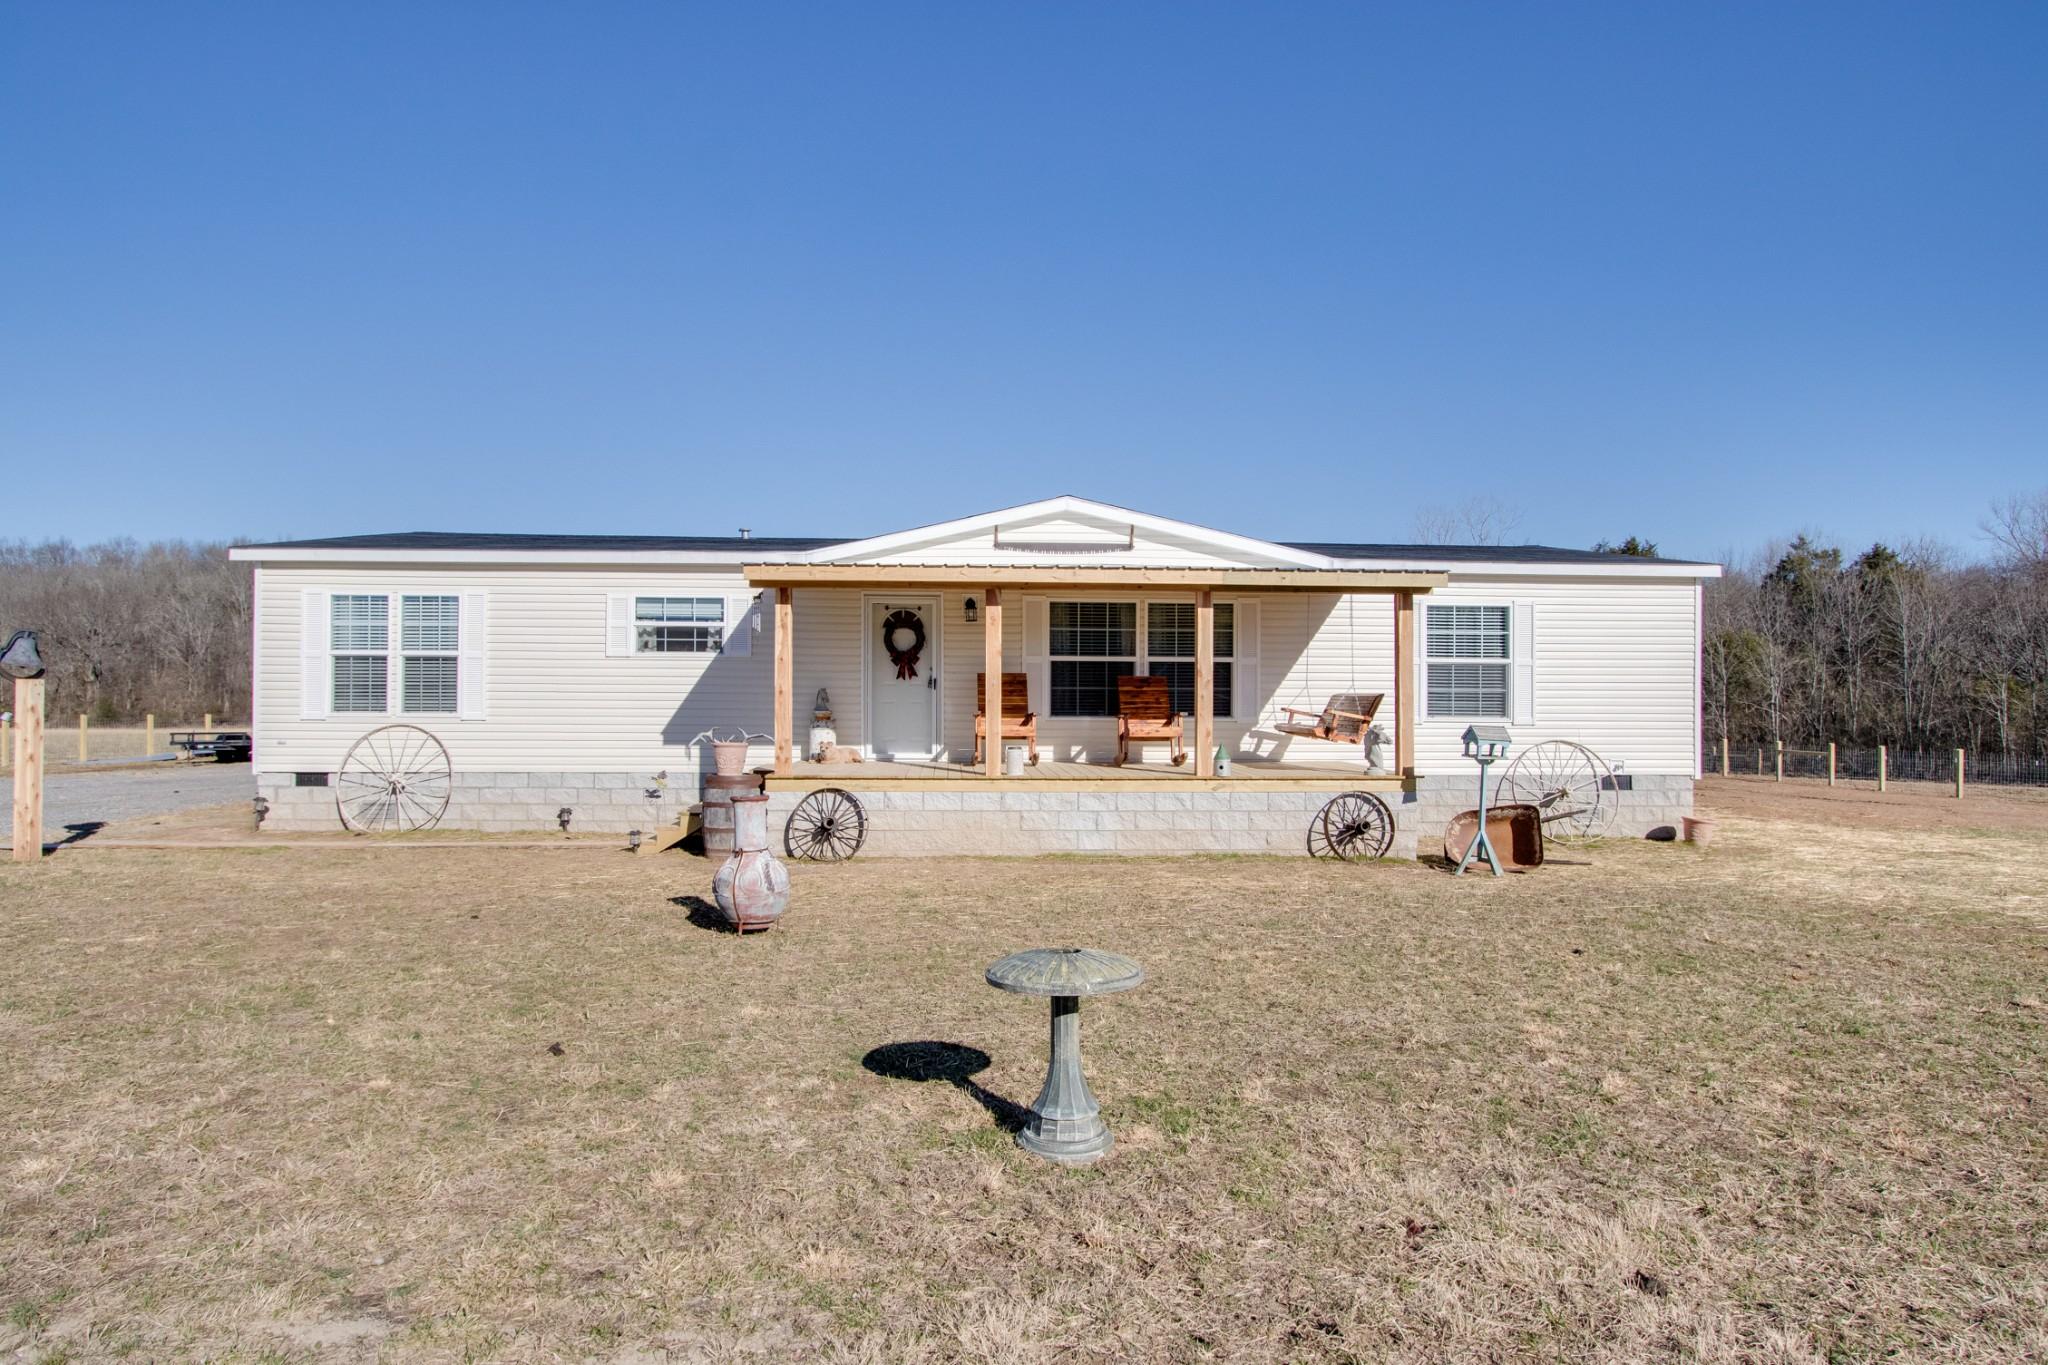 56 Sp McClanahan Rd, Watertown, TN 37184 - Watertown, TN real estate listing